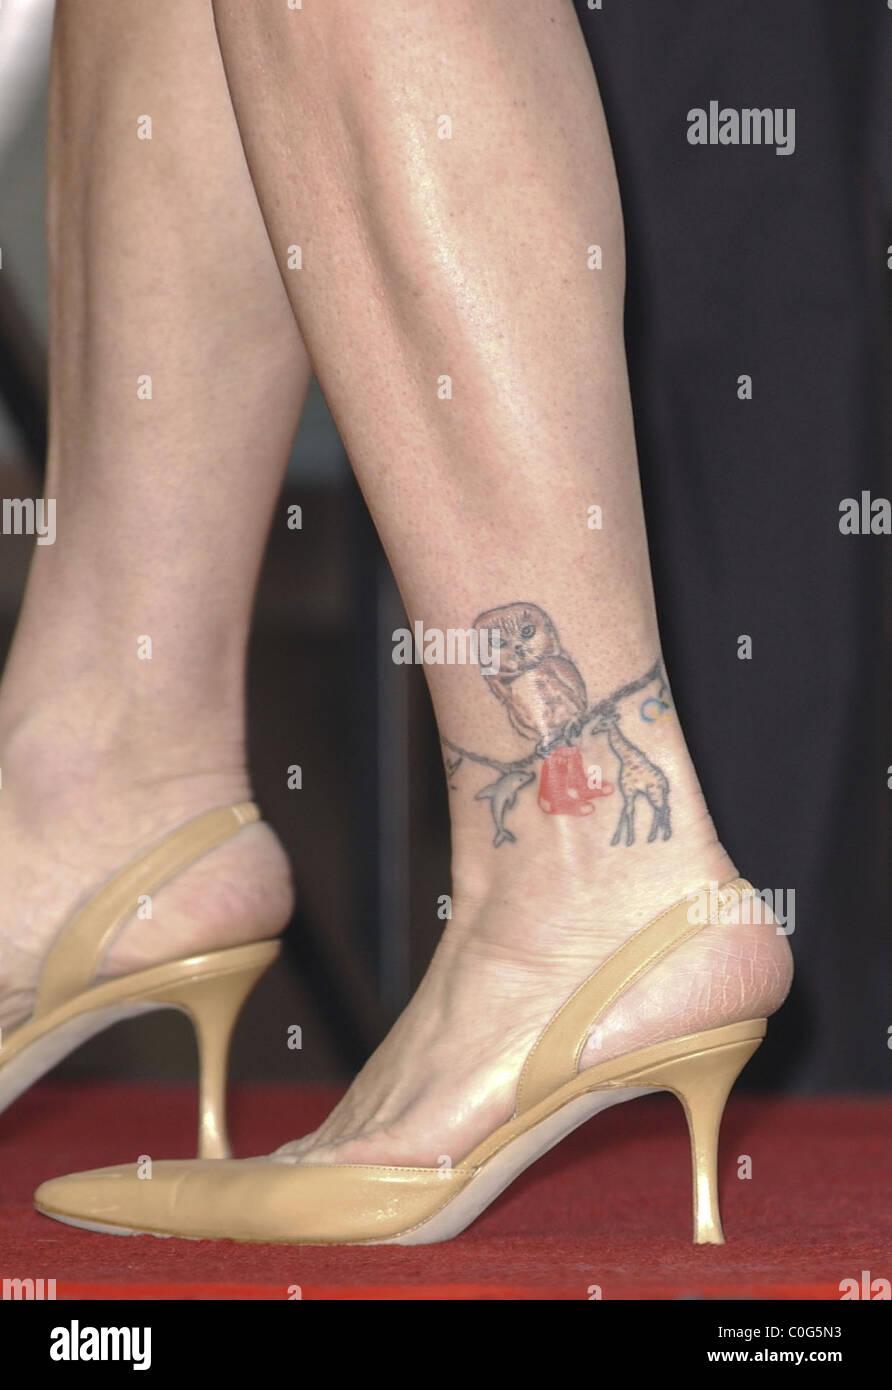 Susan Saint James Knöchel Tattoo Geehrt Mit Dem 2364th Stern Auf